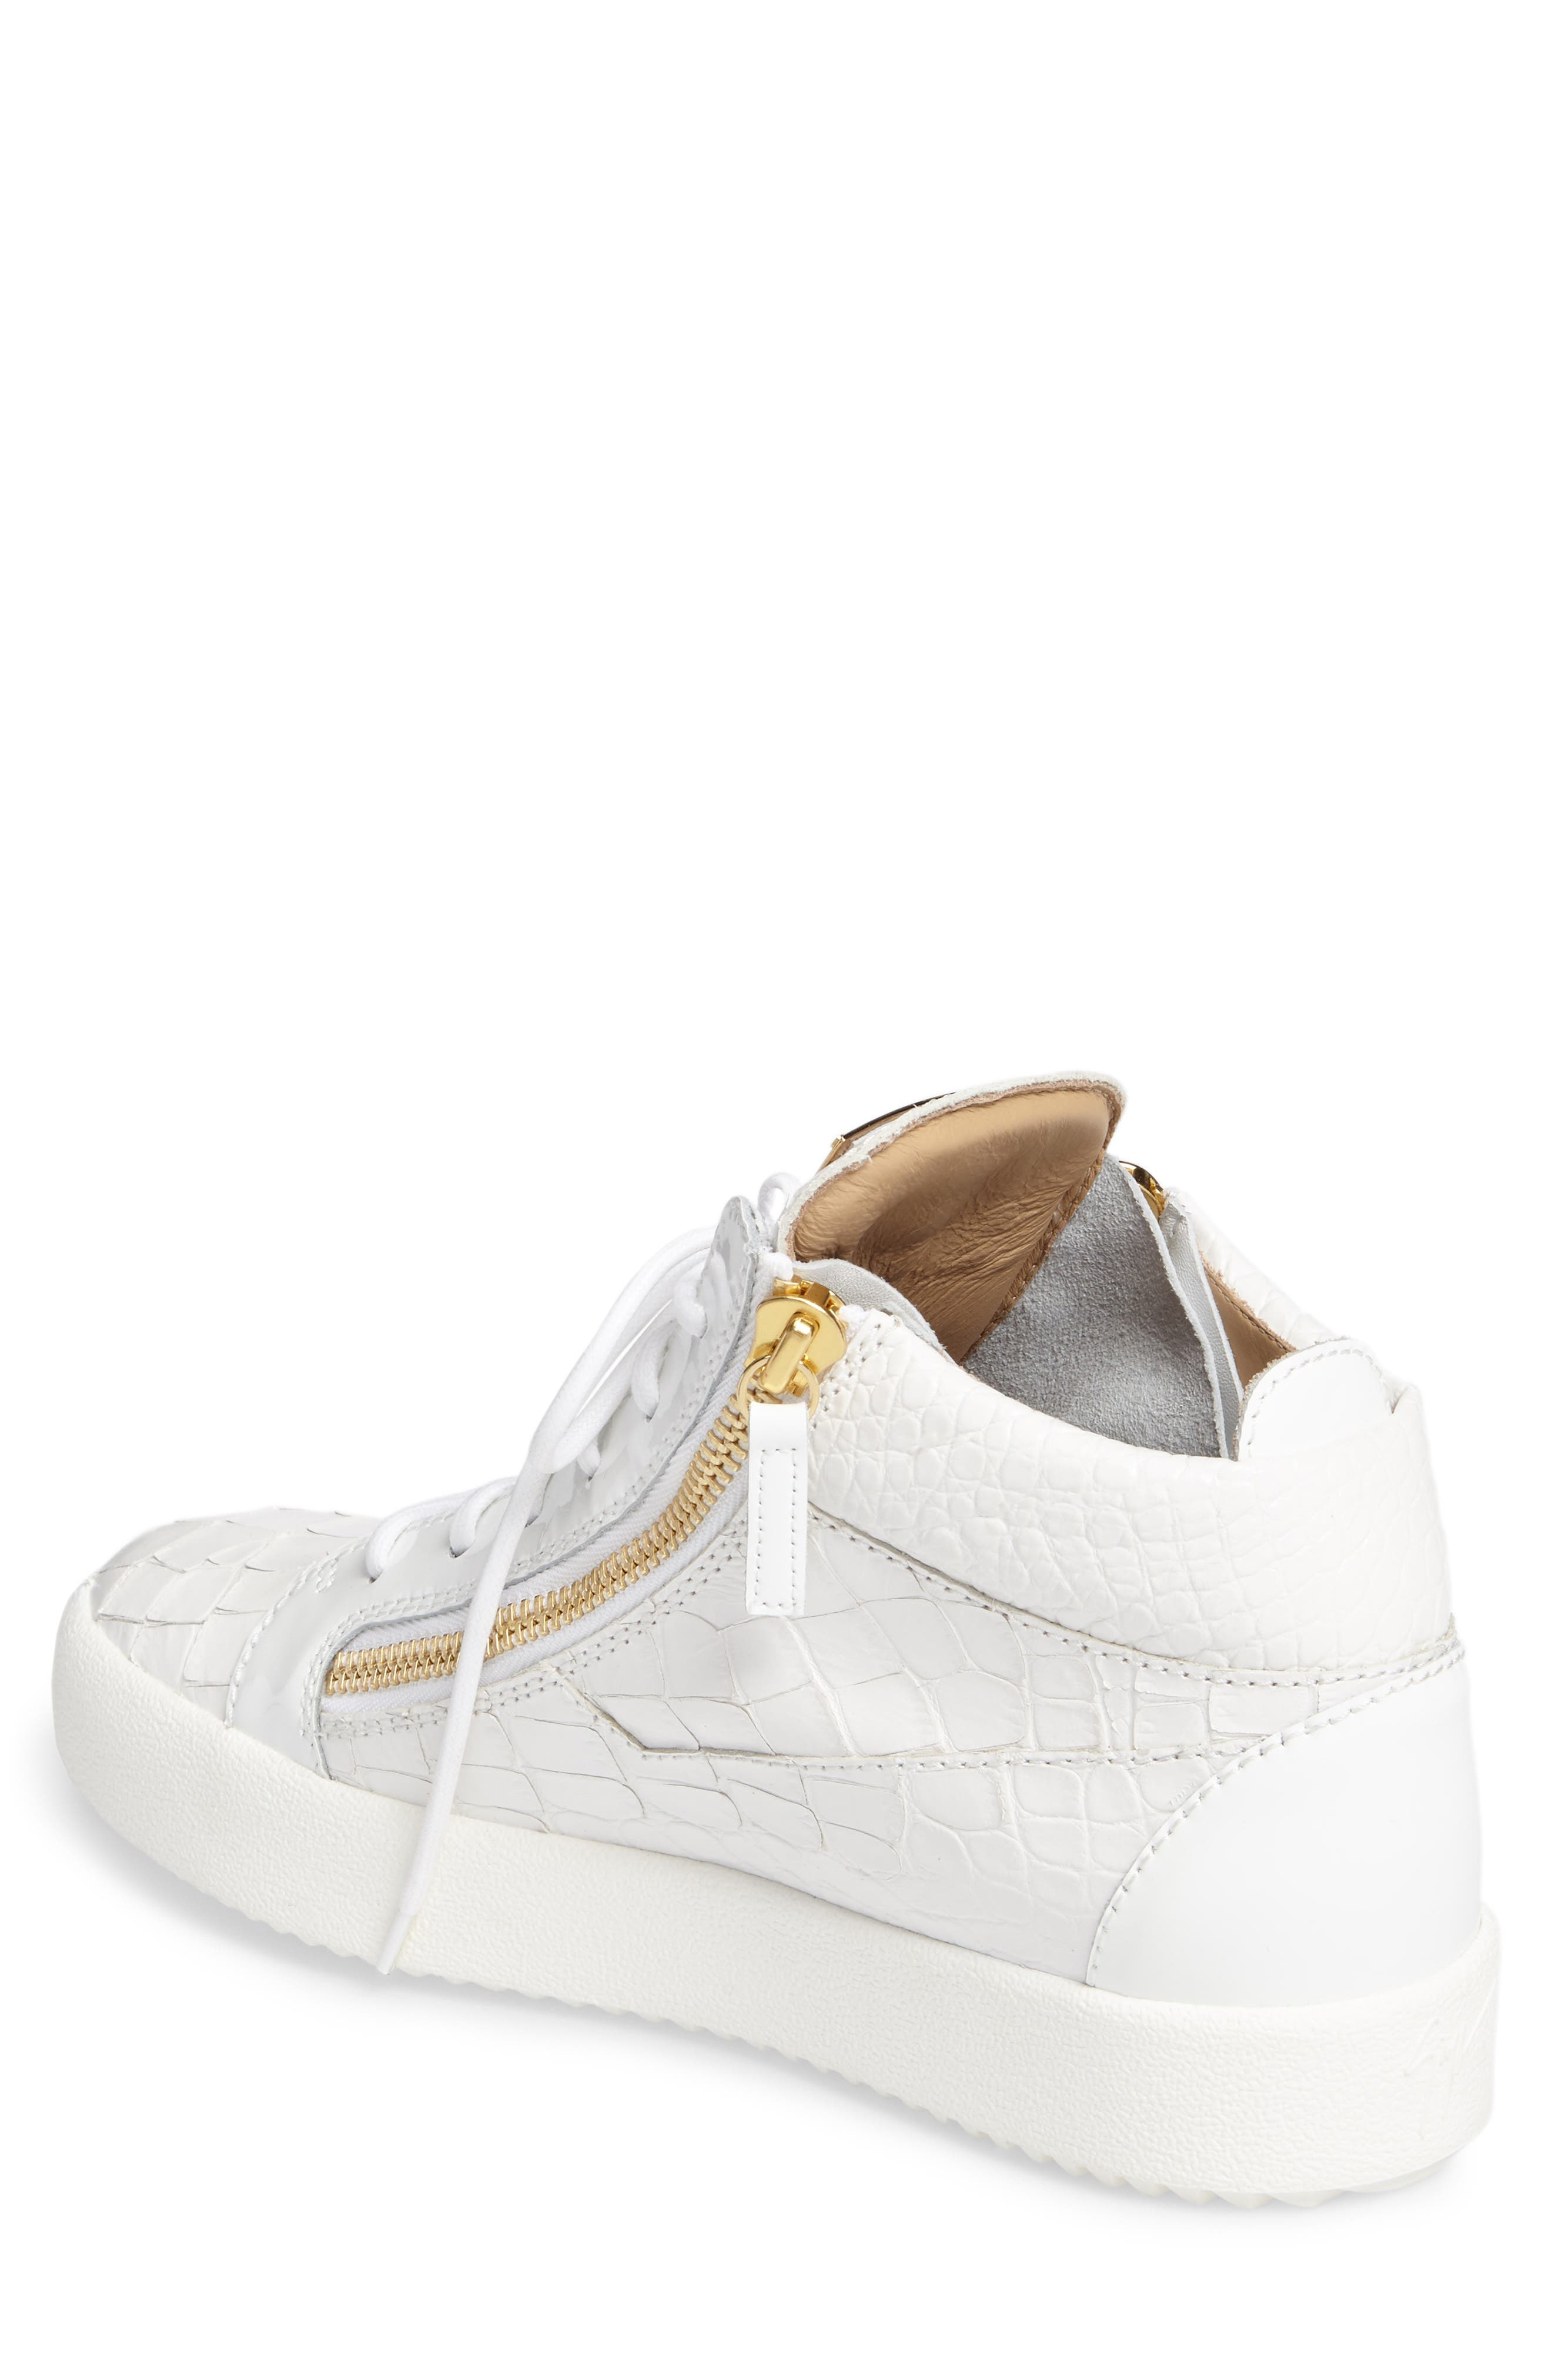 Mid Top Sneaker,                             Alternate thumbnail 2, color,                             WHITE